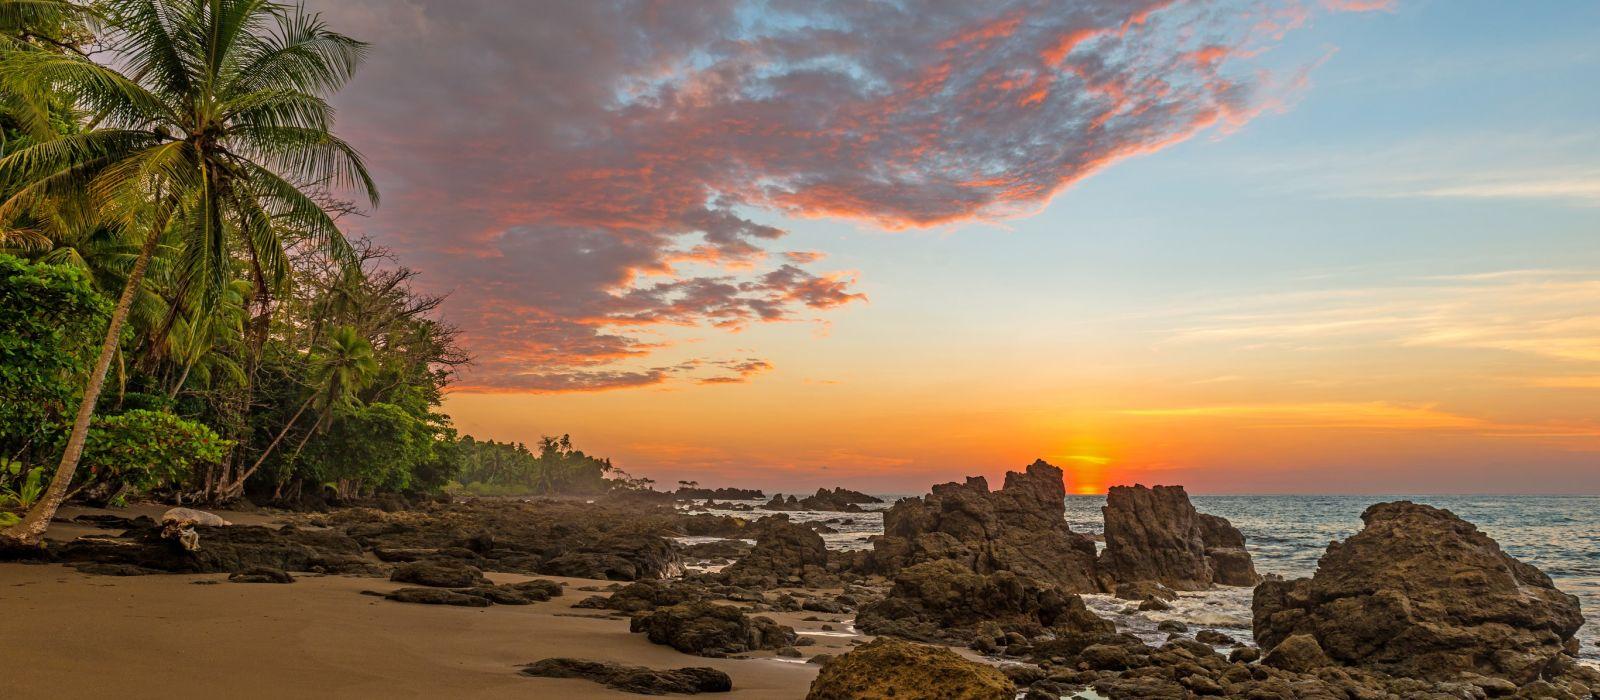 Reiseziel Halbinsel Osa Costa Rica